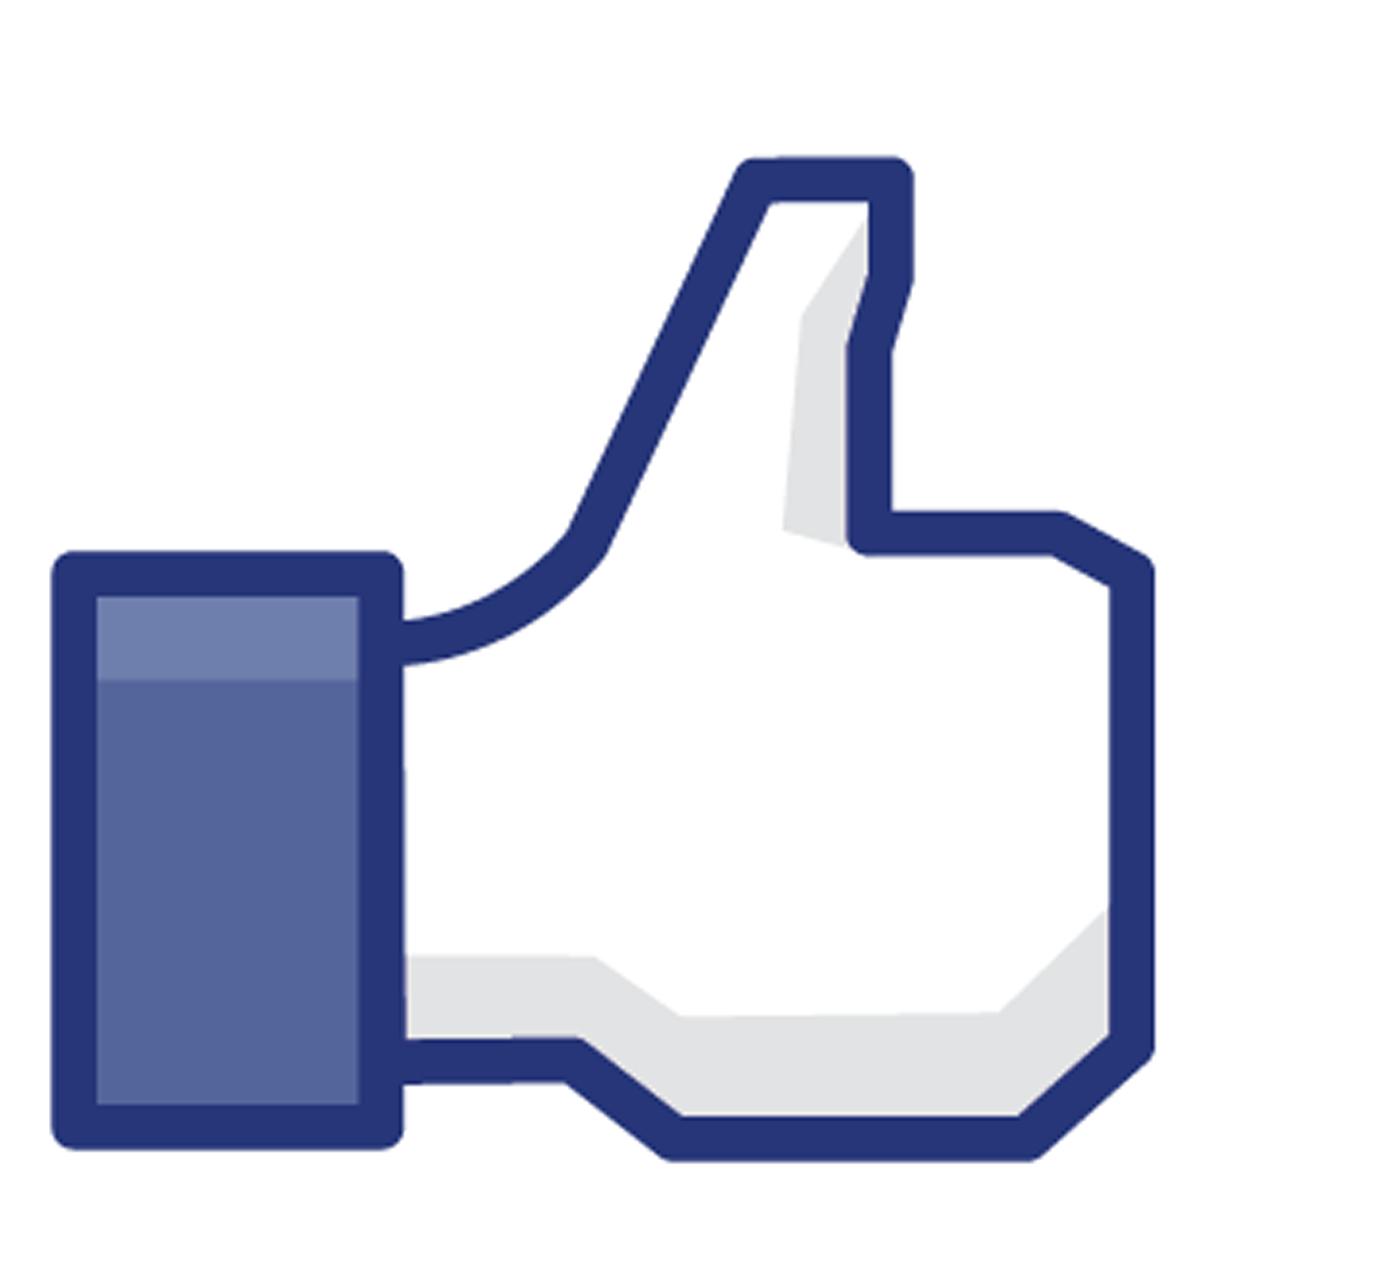 Facebook Growth India